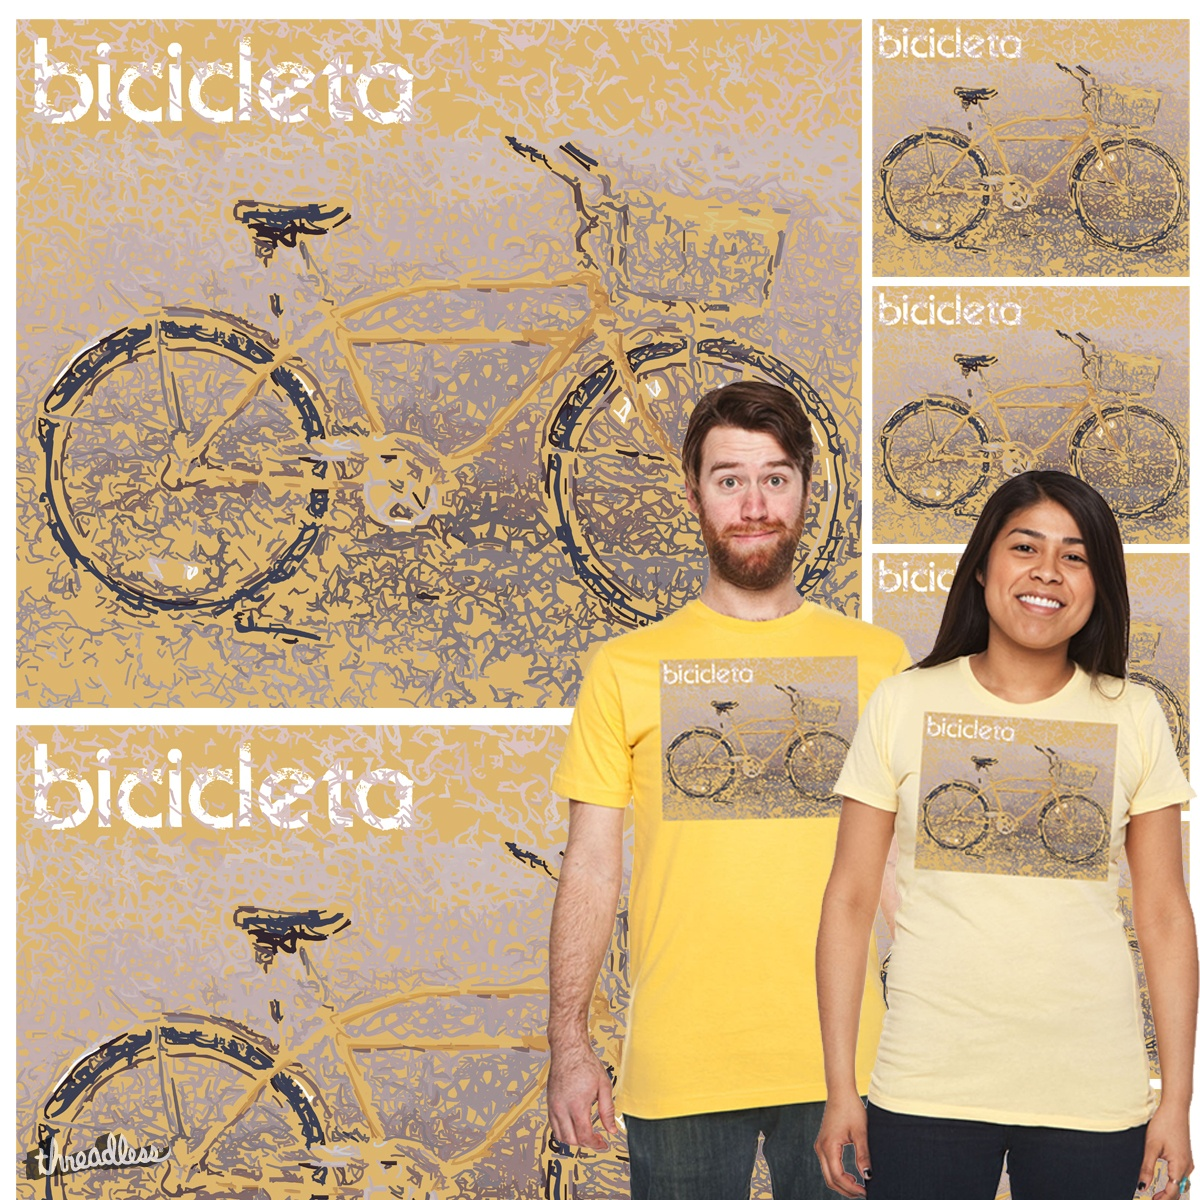 Bicicleta (Bicycle), a cool t-shirt design